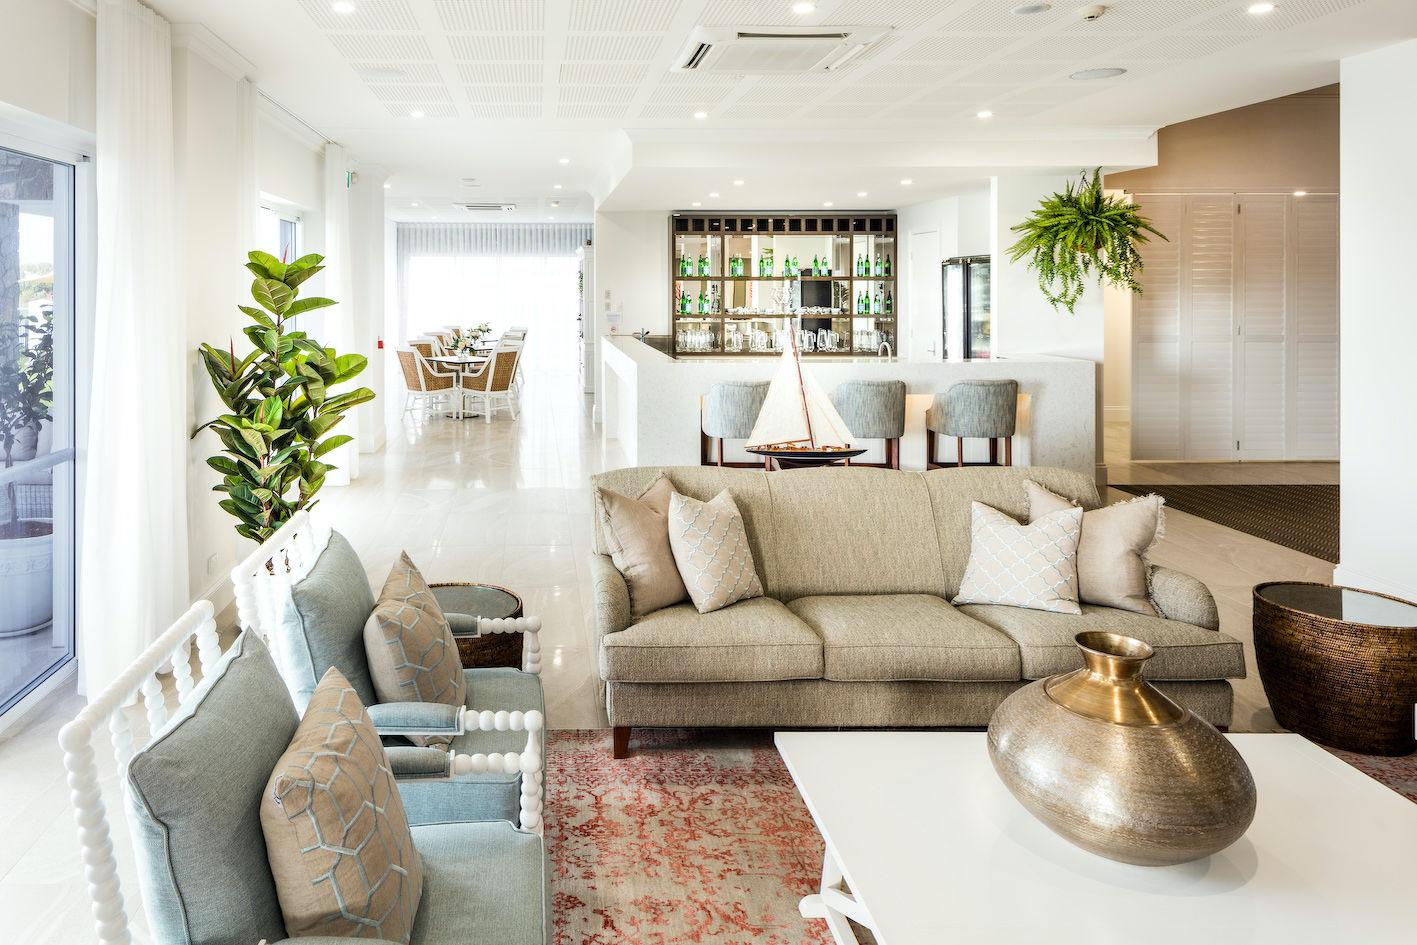 EDGEPROP SINGAPORE - The residents' indoor lounge at GemLife Bribie Island, Queensland (Photo: GemLife)